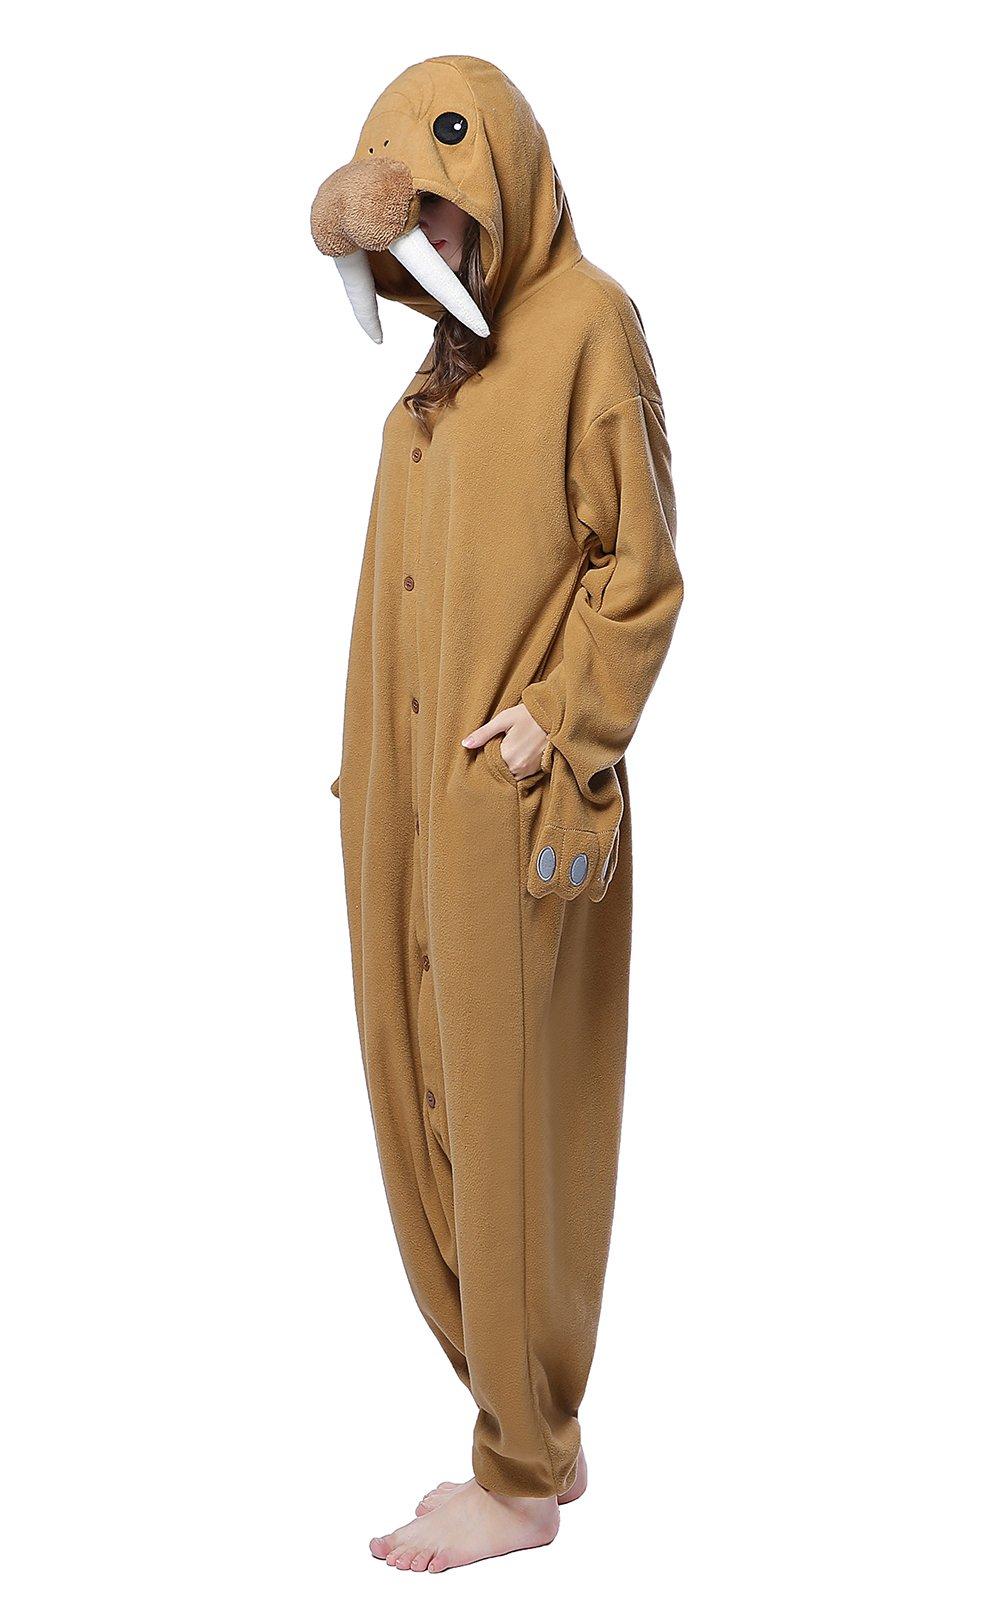 NEWCOSPLAY Halloween Cartoon Cosplay Costumes Adult Unicorn Pajamas (XL-for Height 5'11''-6'2'', Walrus)